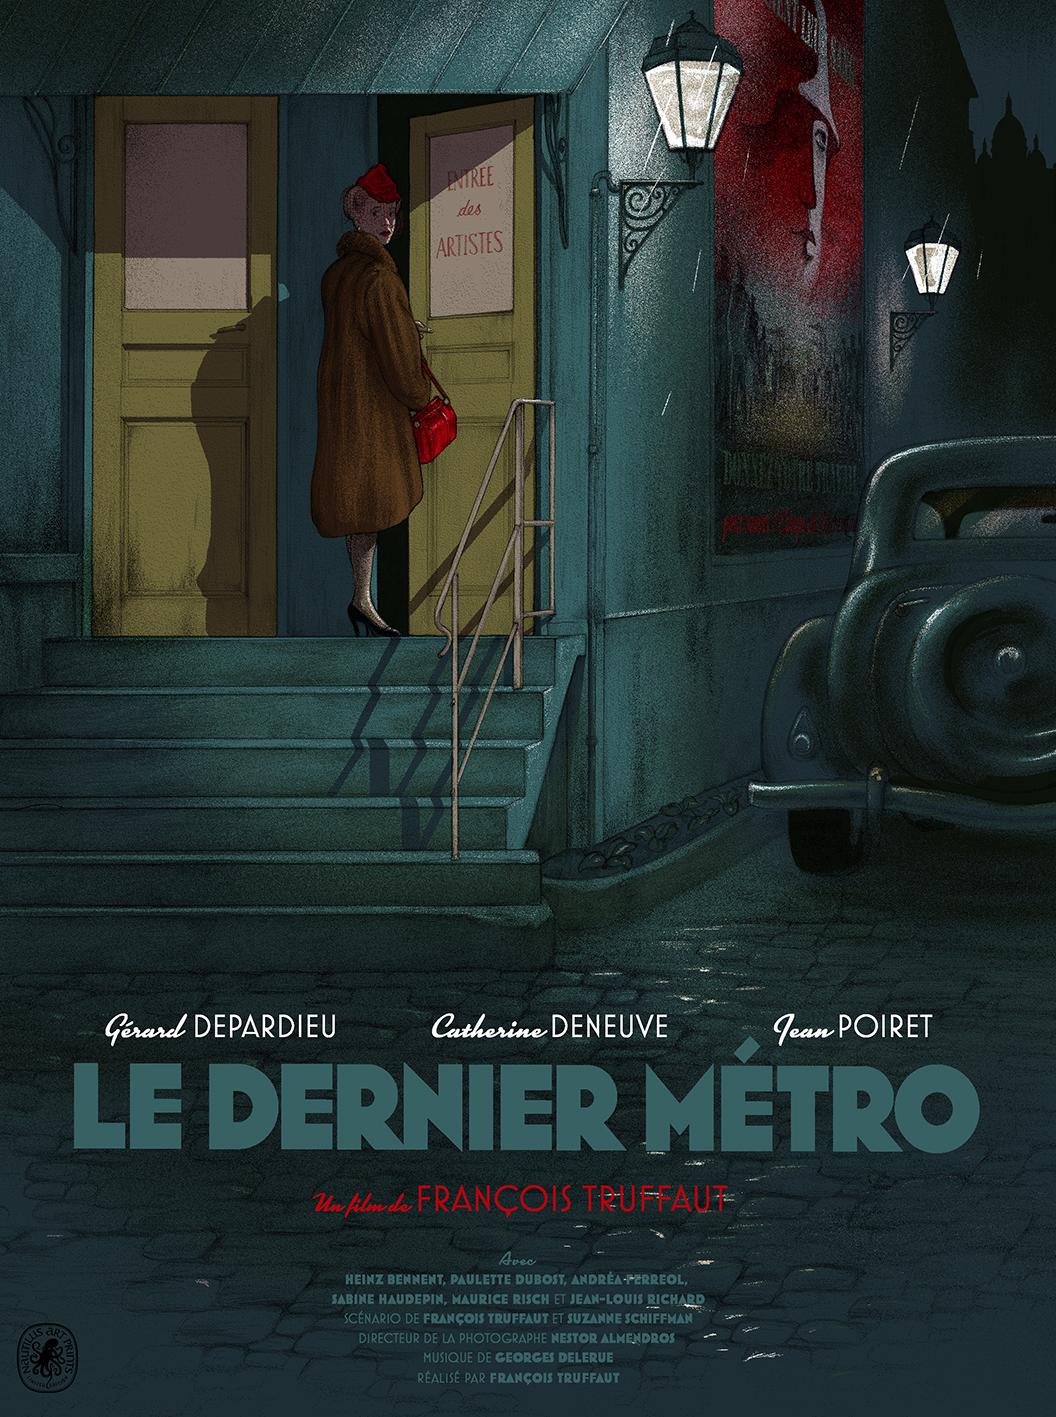 Le Dernier Metro FINAL_2.jpg